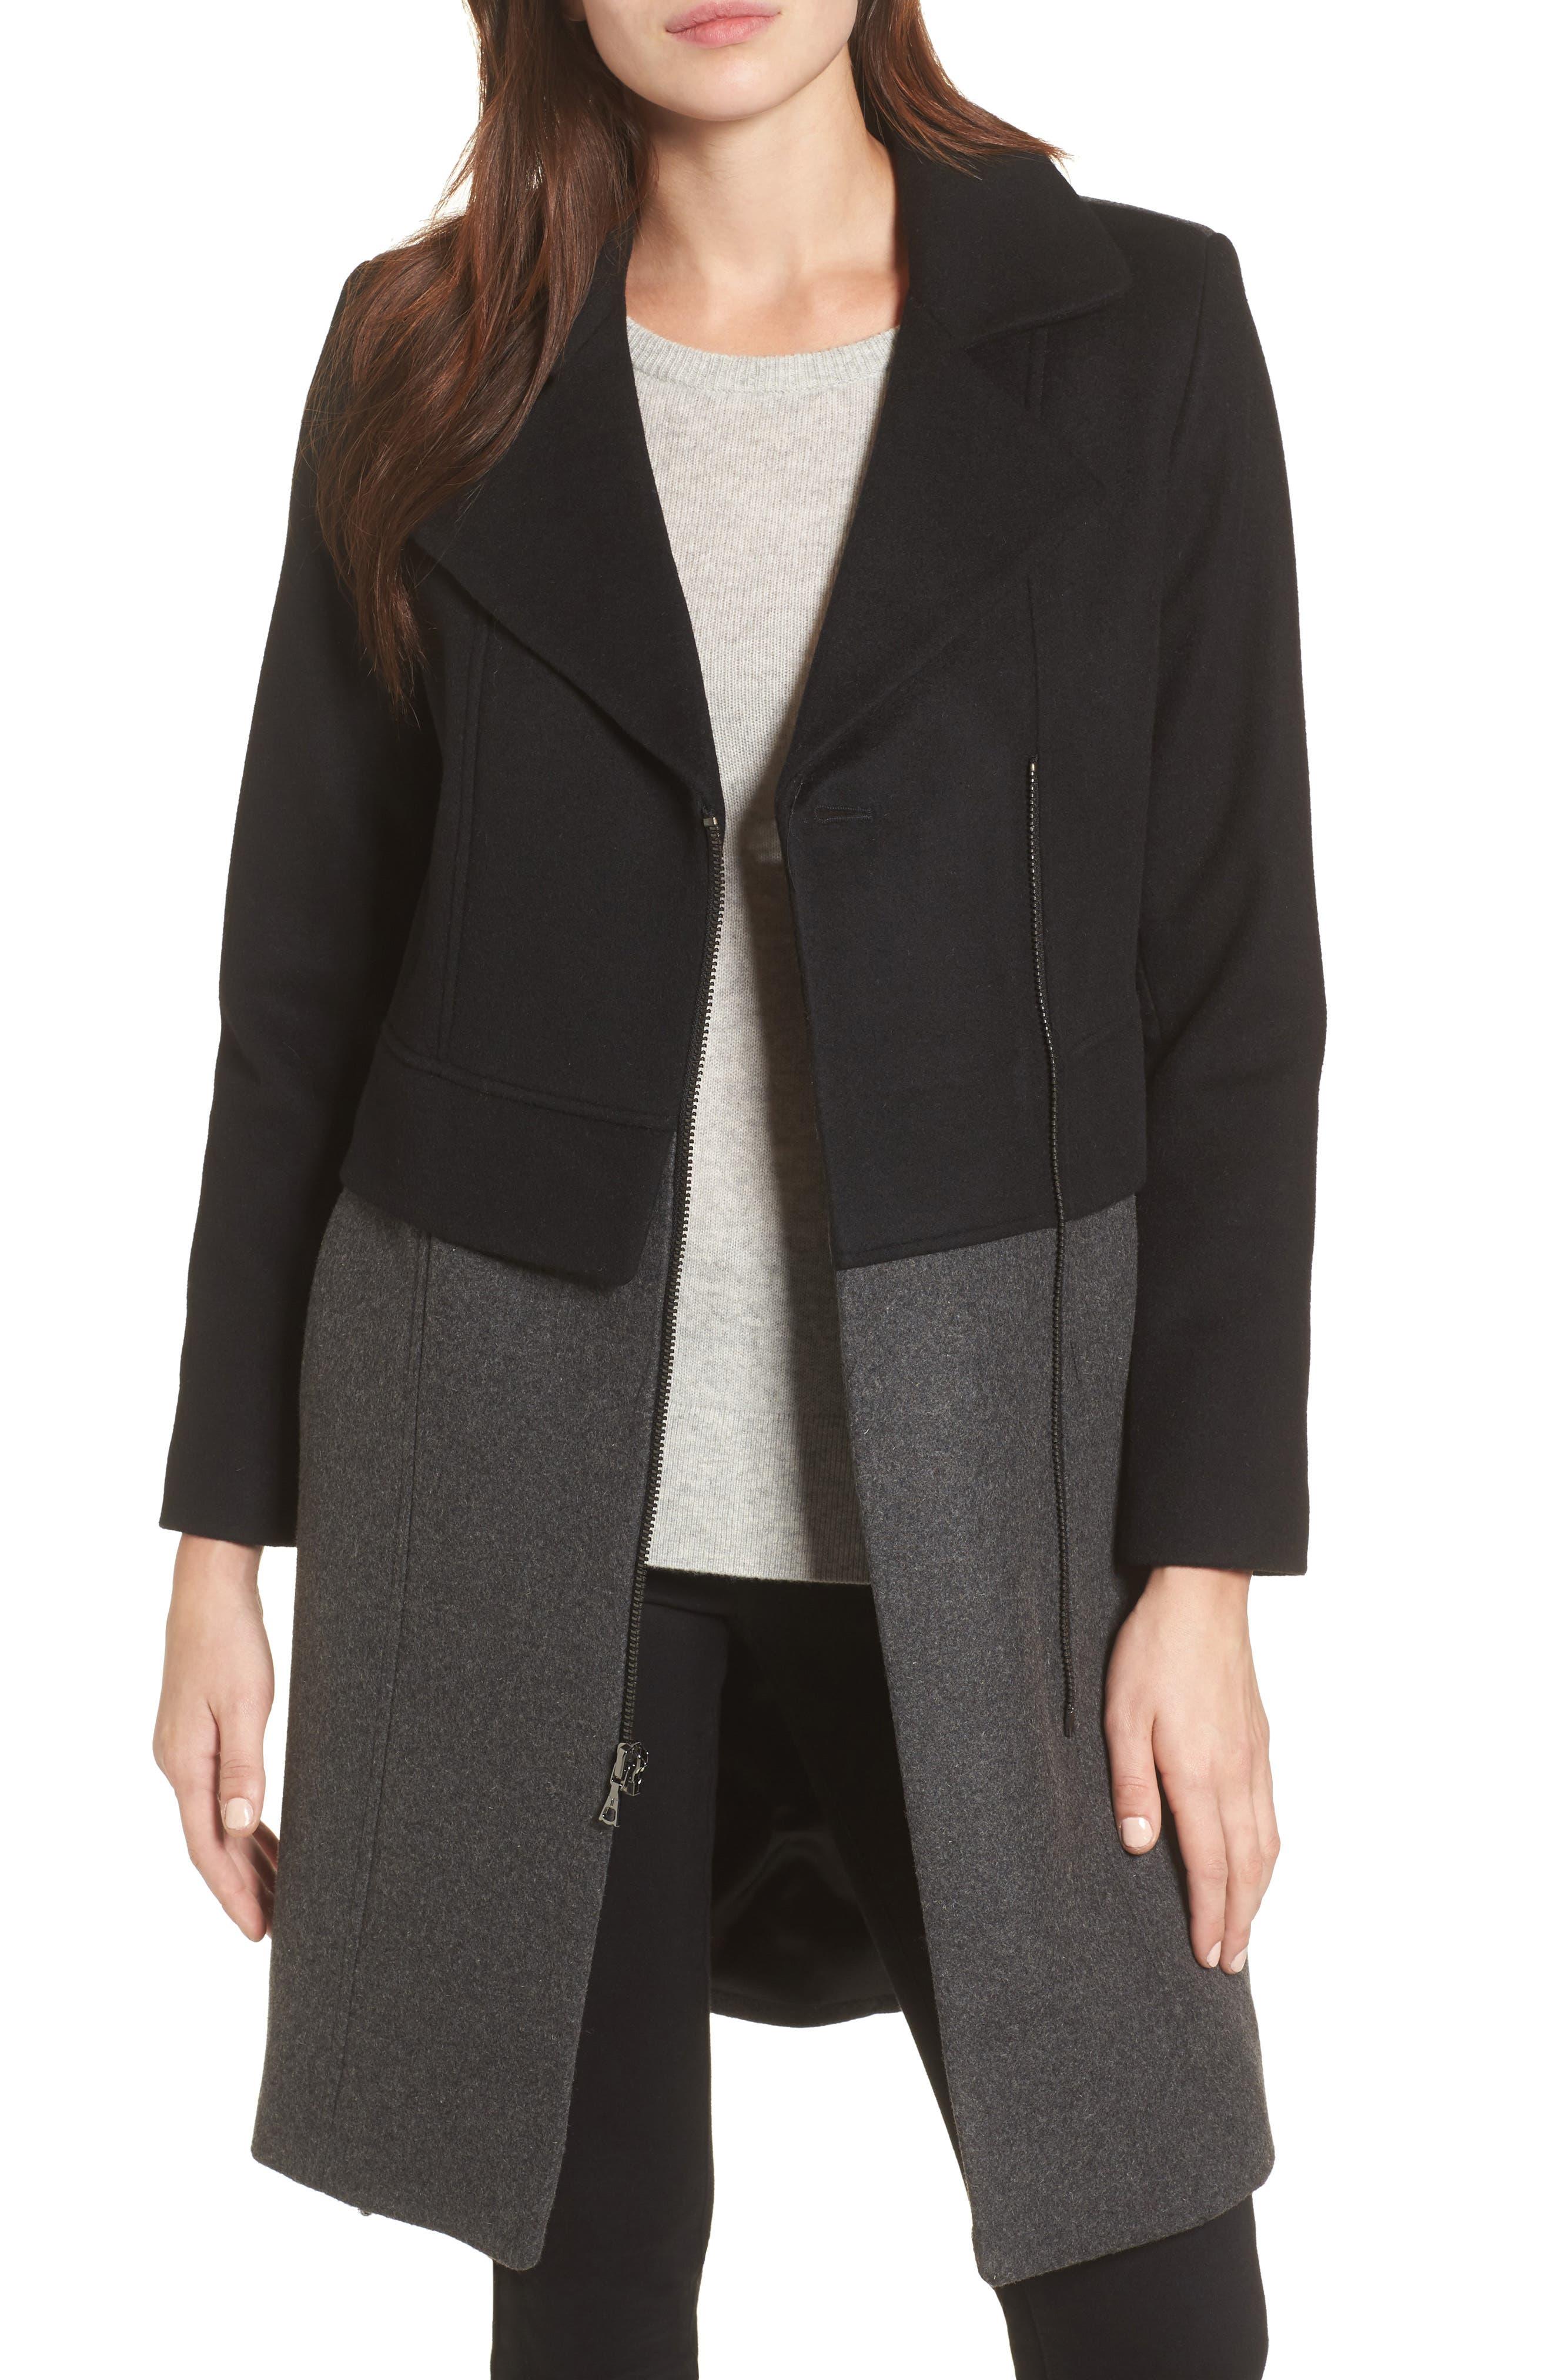 Brooklyn Colorblock Coat,                             Main thumbnail 1, color,                             Grey/ Black